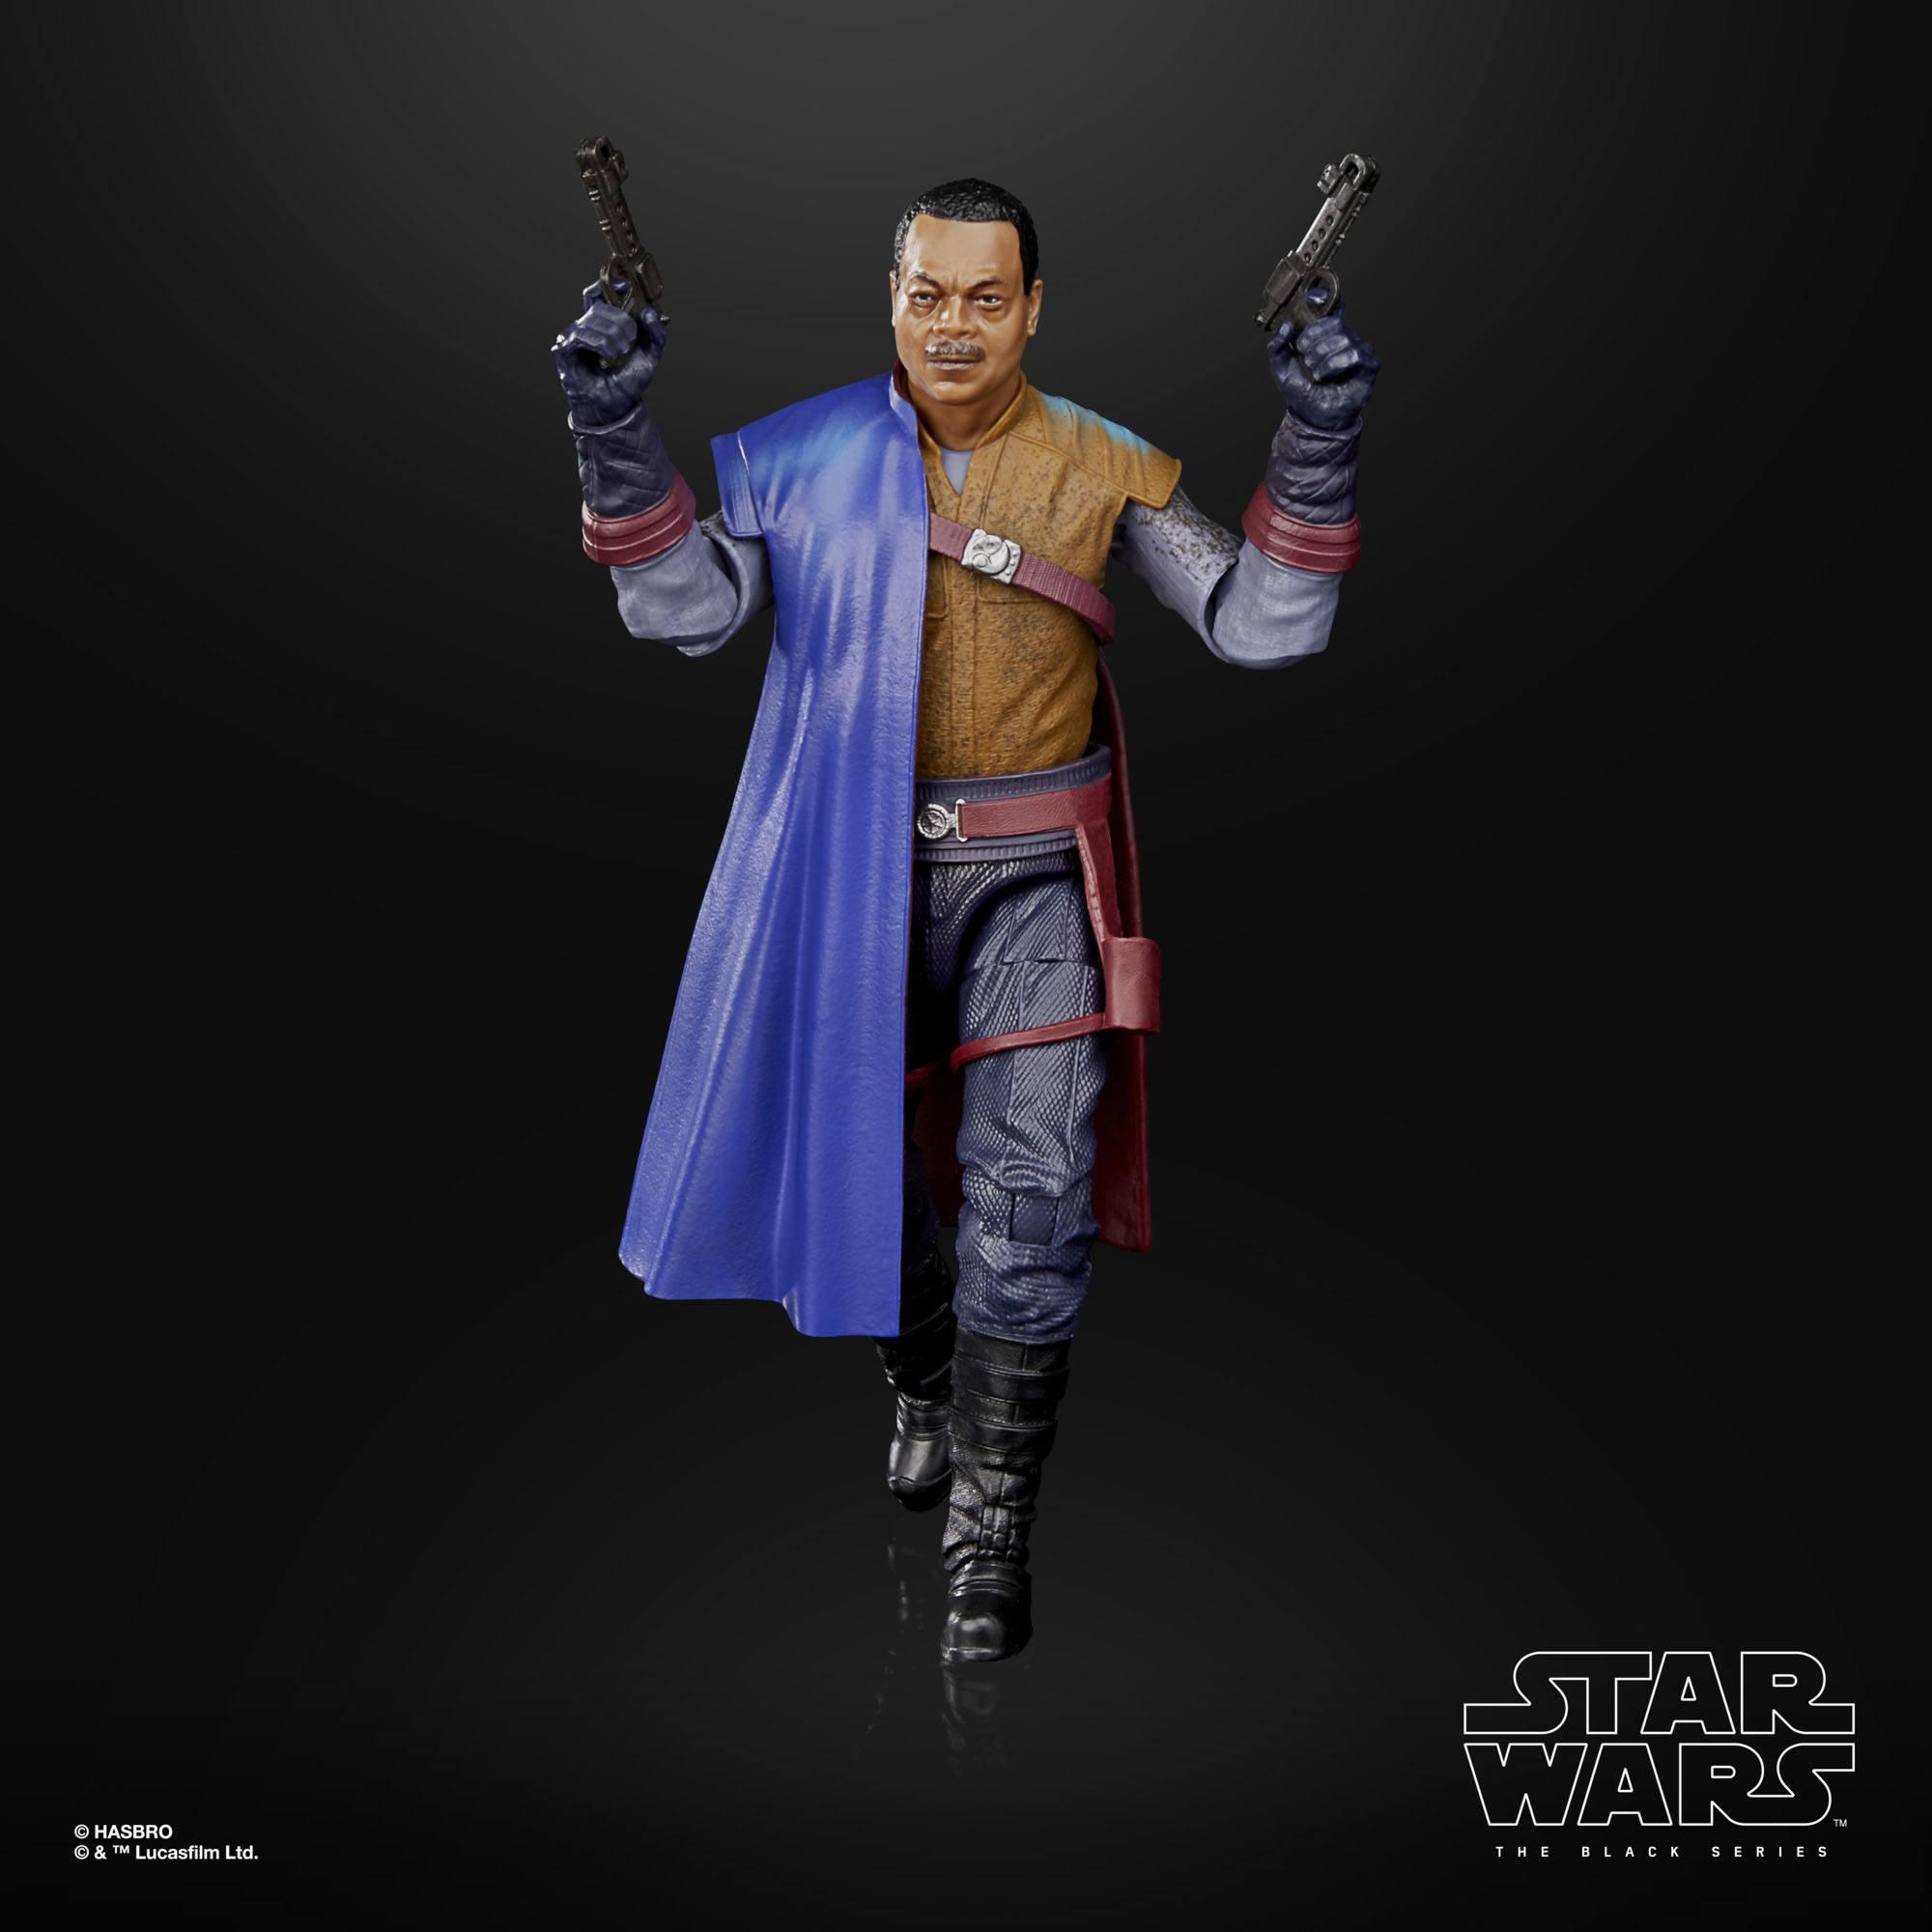 Star Wars The Mandalorian Black Series Credit Collection Actionfigur 2022 Greef Karga 15 cm HASF2895 5010993911936